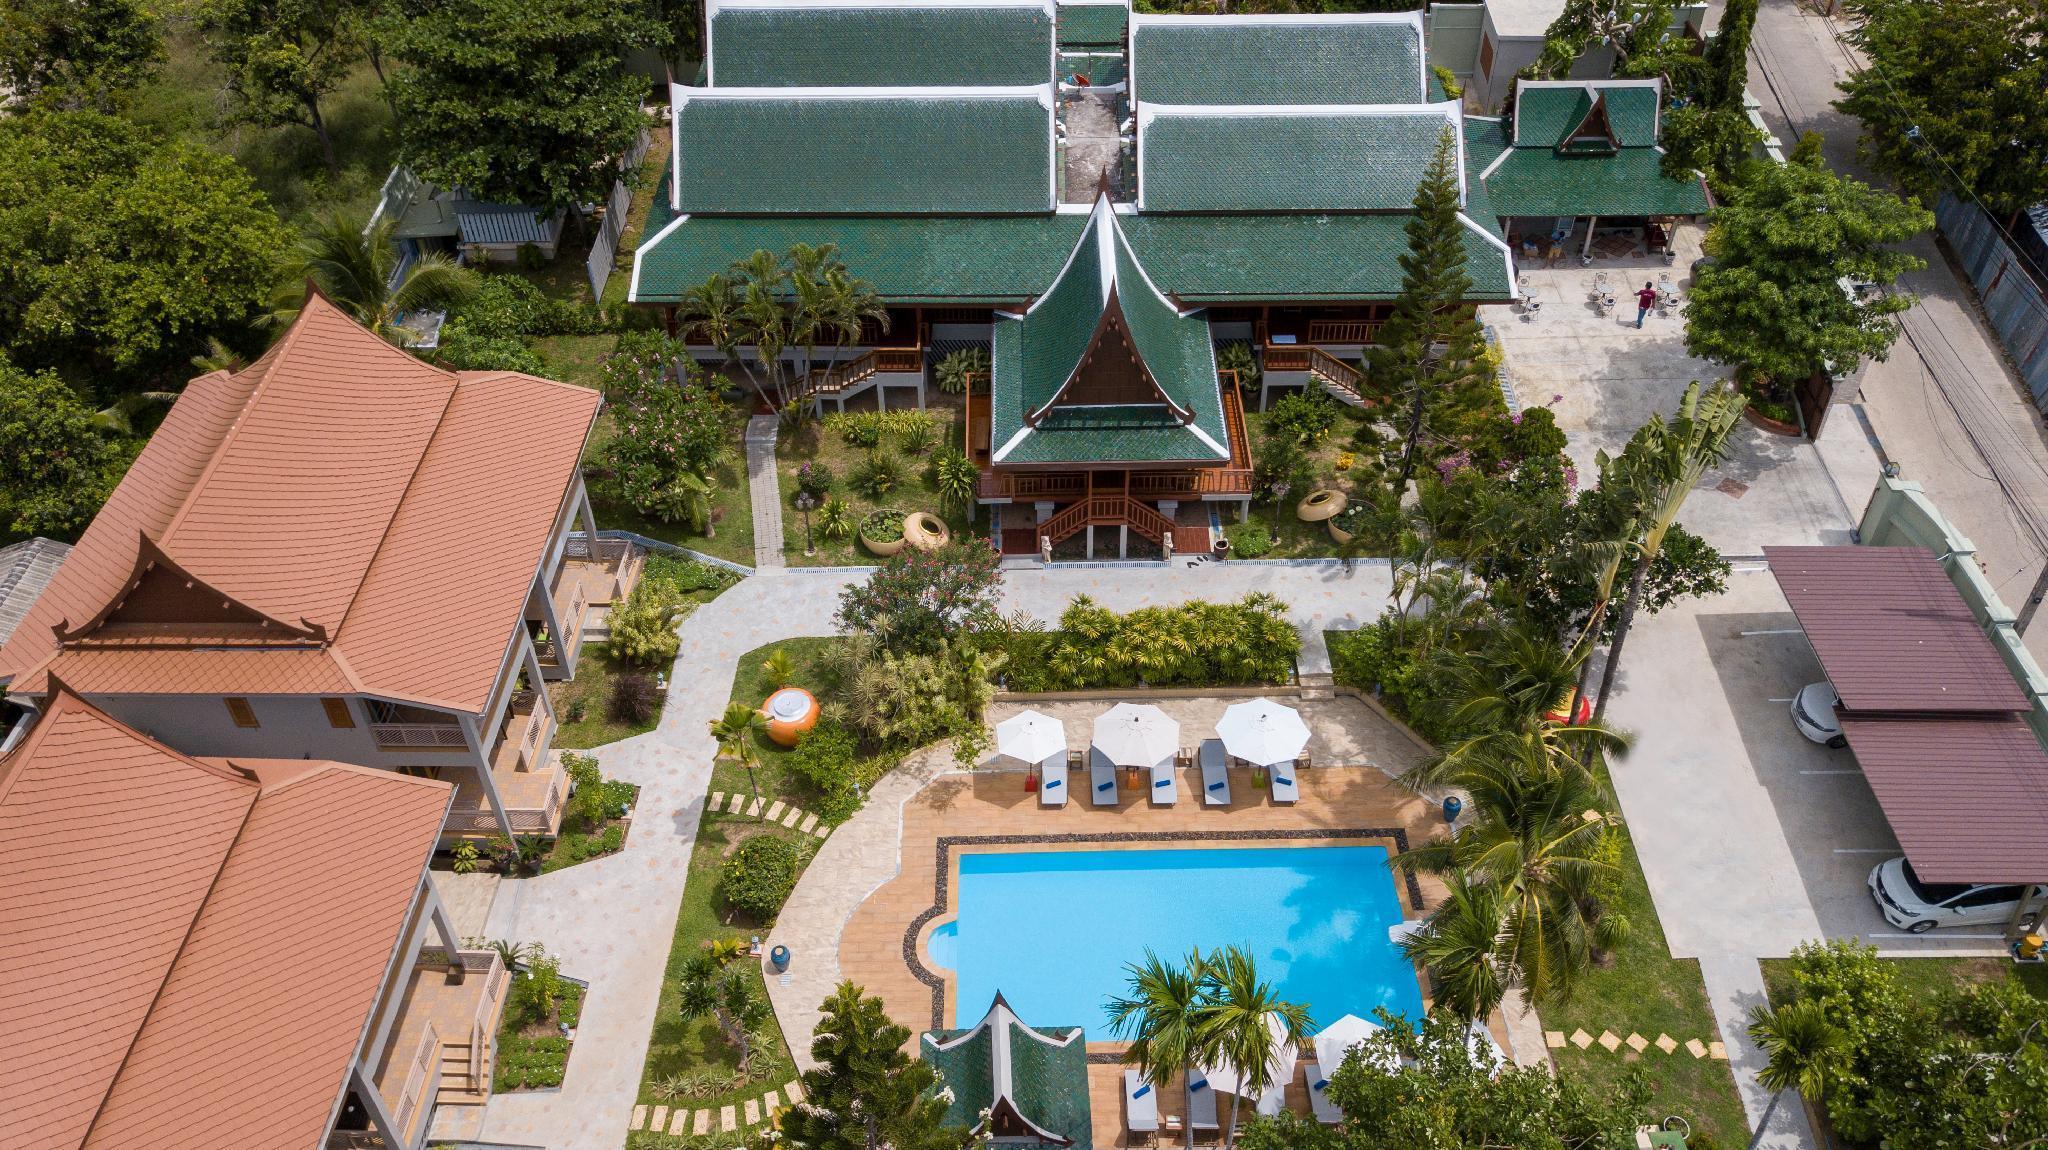 Wandee Garden Villa สตูดิโอ วิลลา 1 ห้องน้ำส่วนตัว ขนาด 20 ตร.ม. – เชิงมน